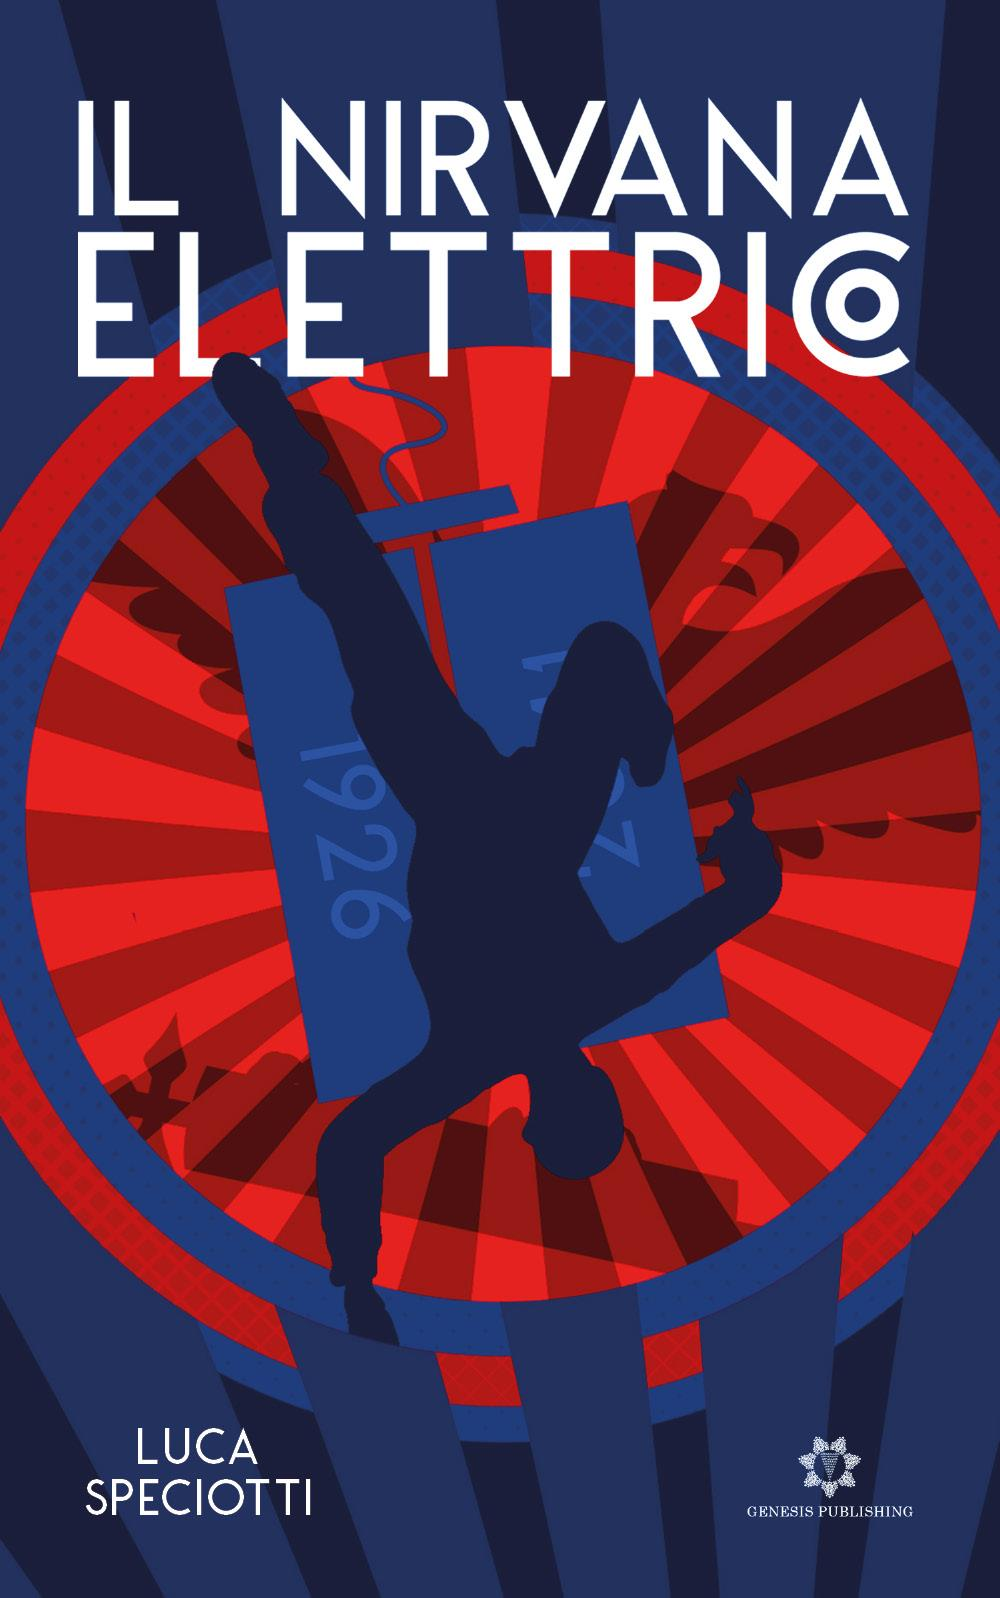 Il Nirvana elettrico